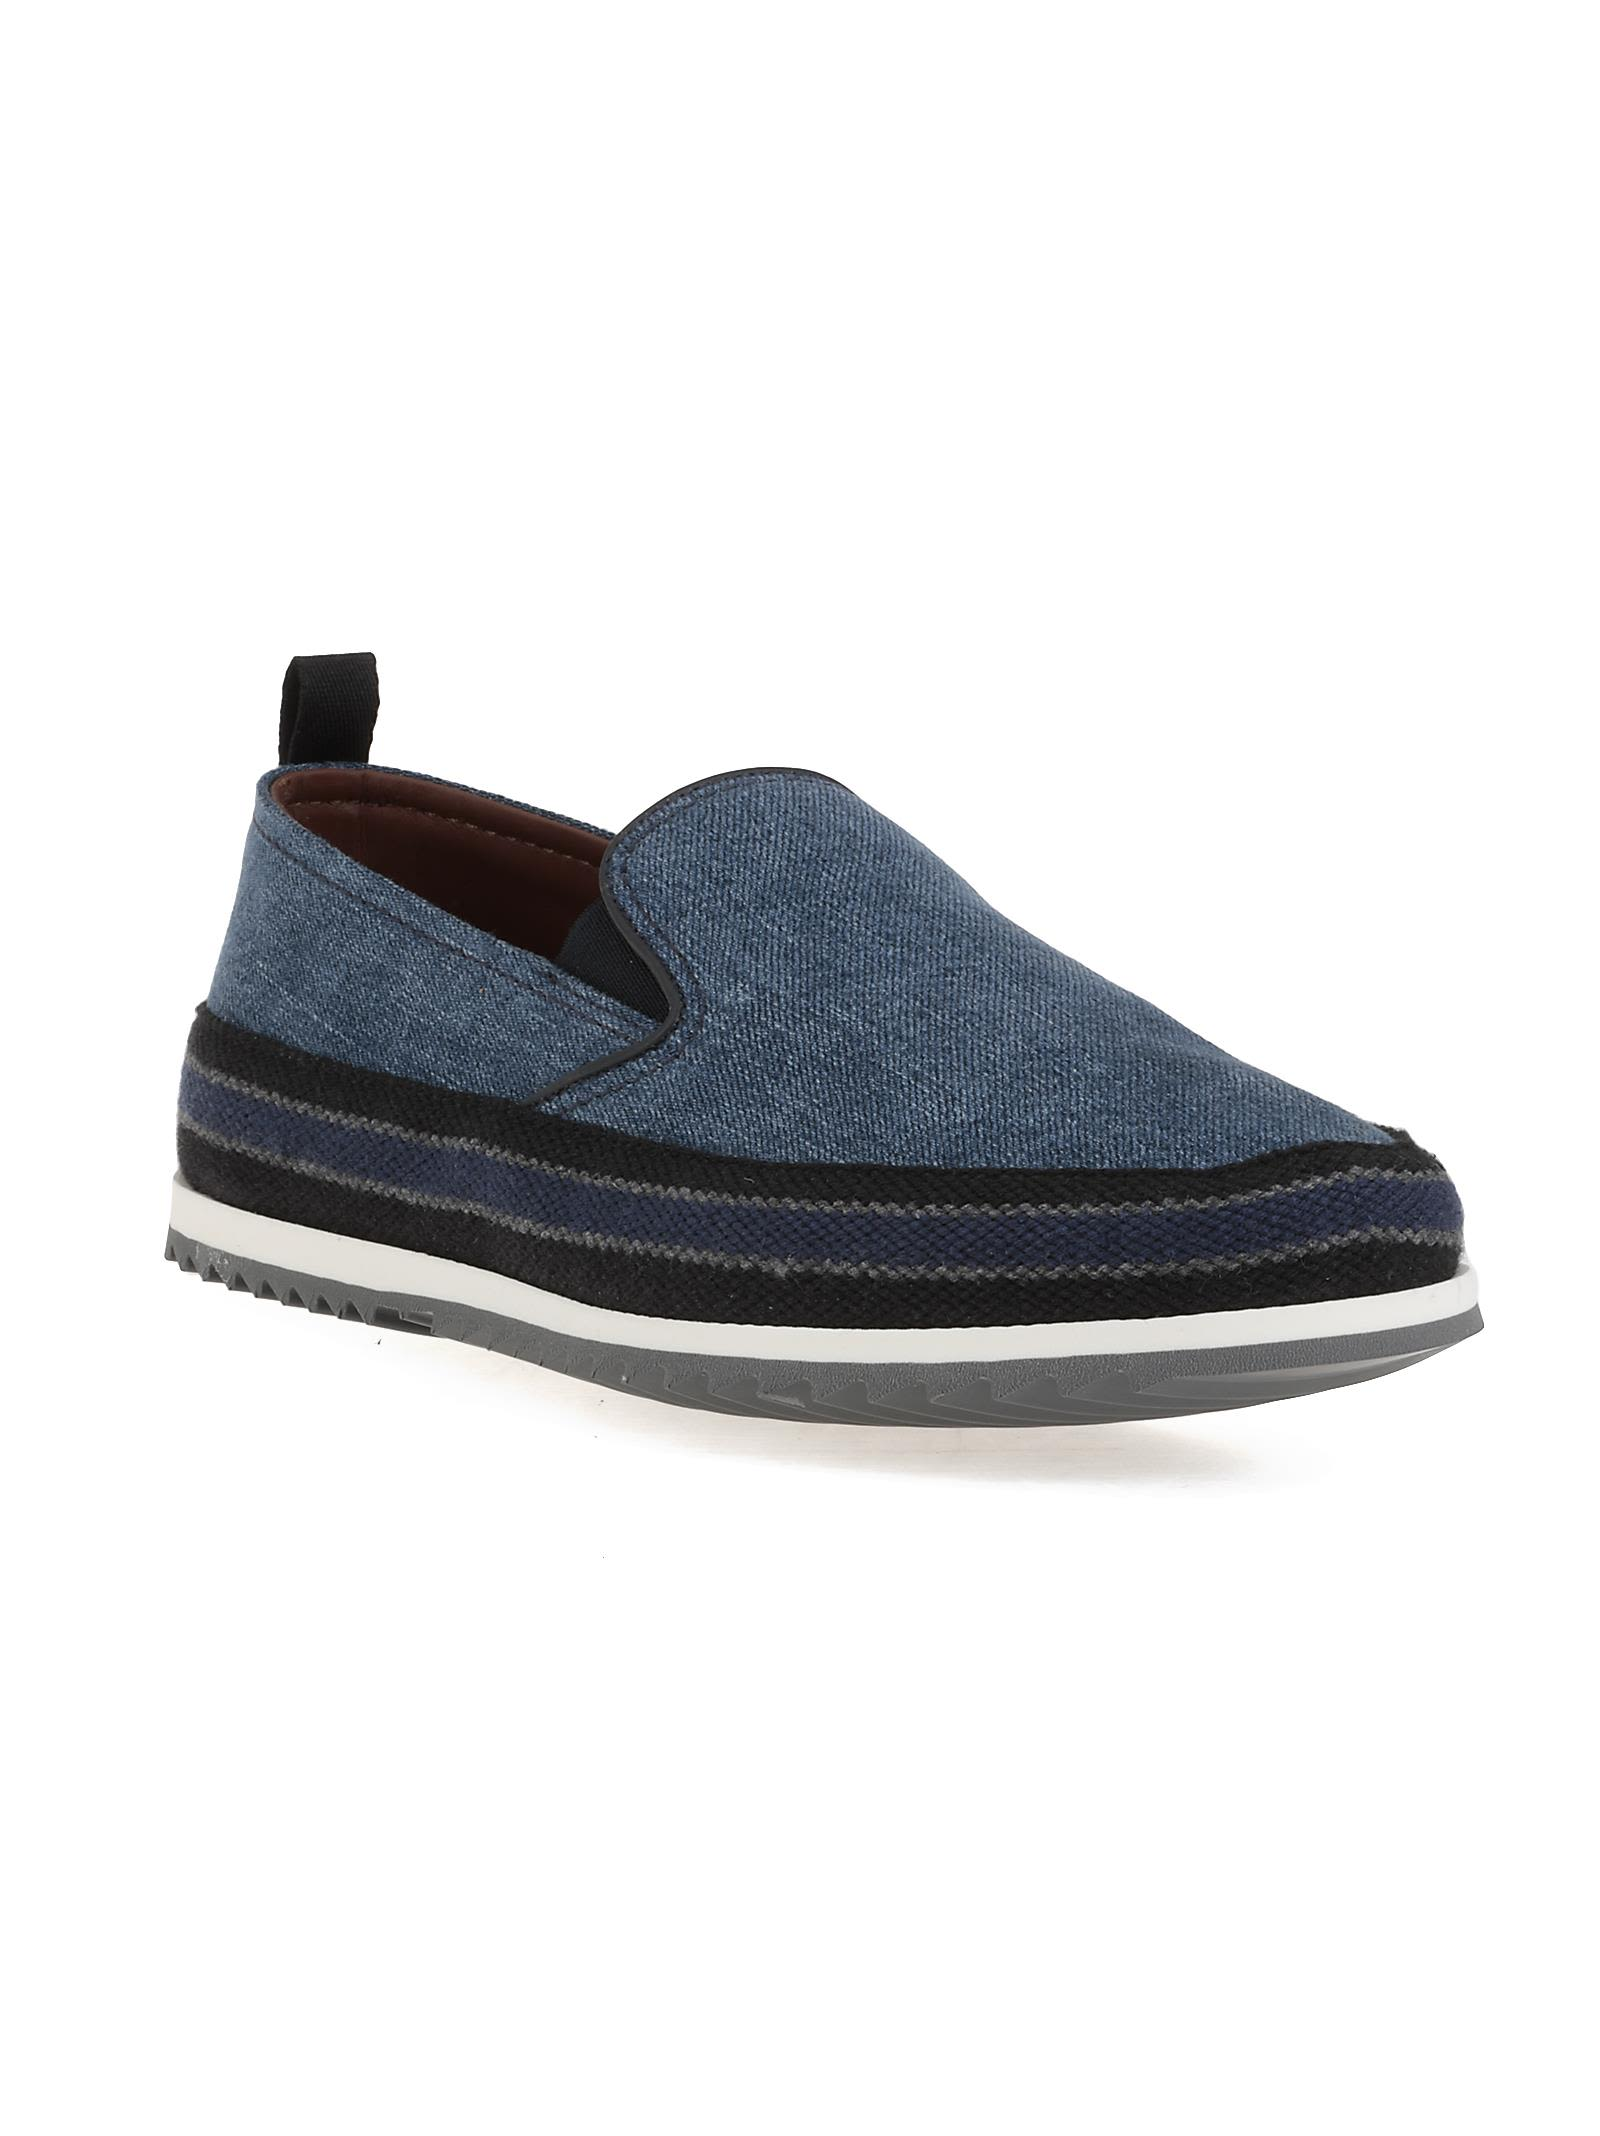 slip-on sneakers - Blue Car Shoe ZSSxis8